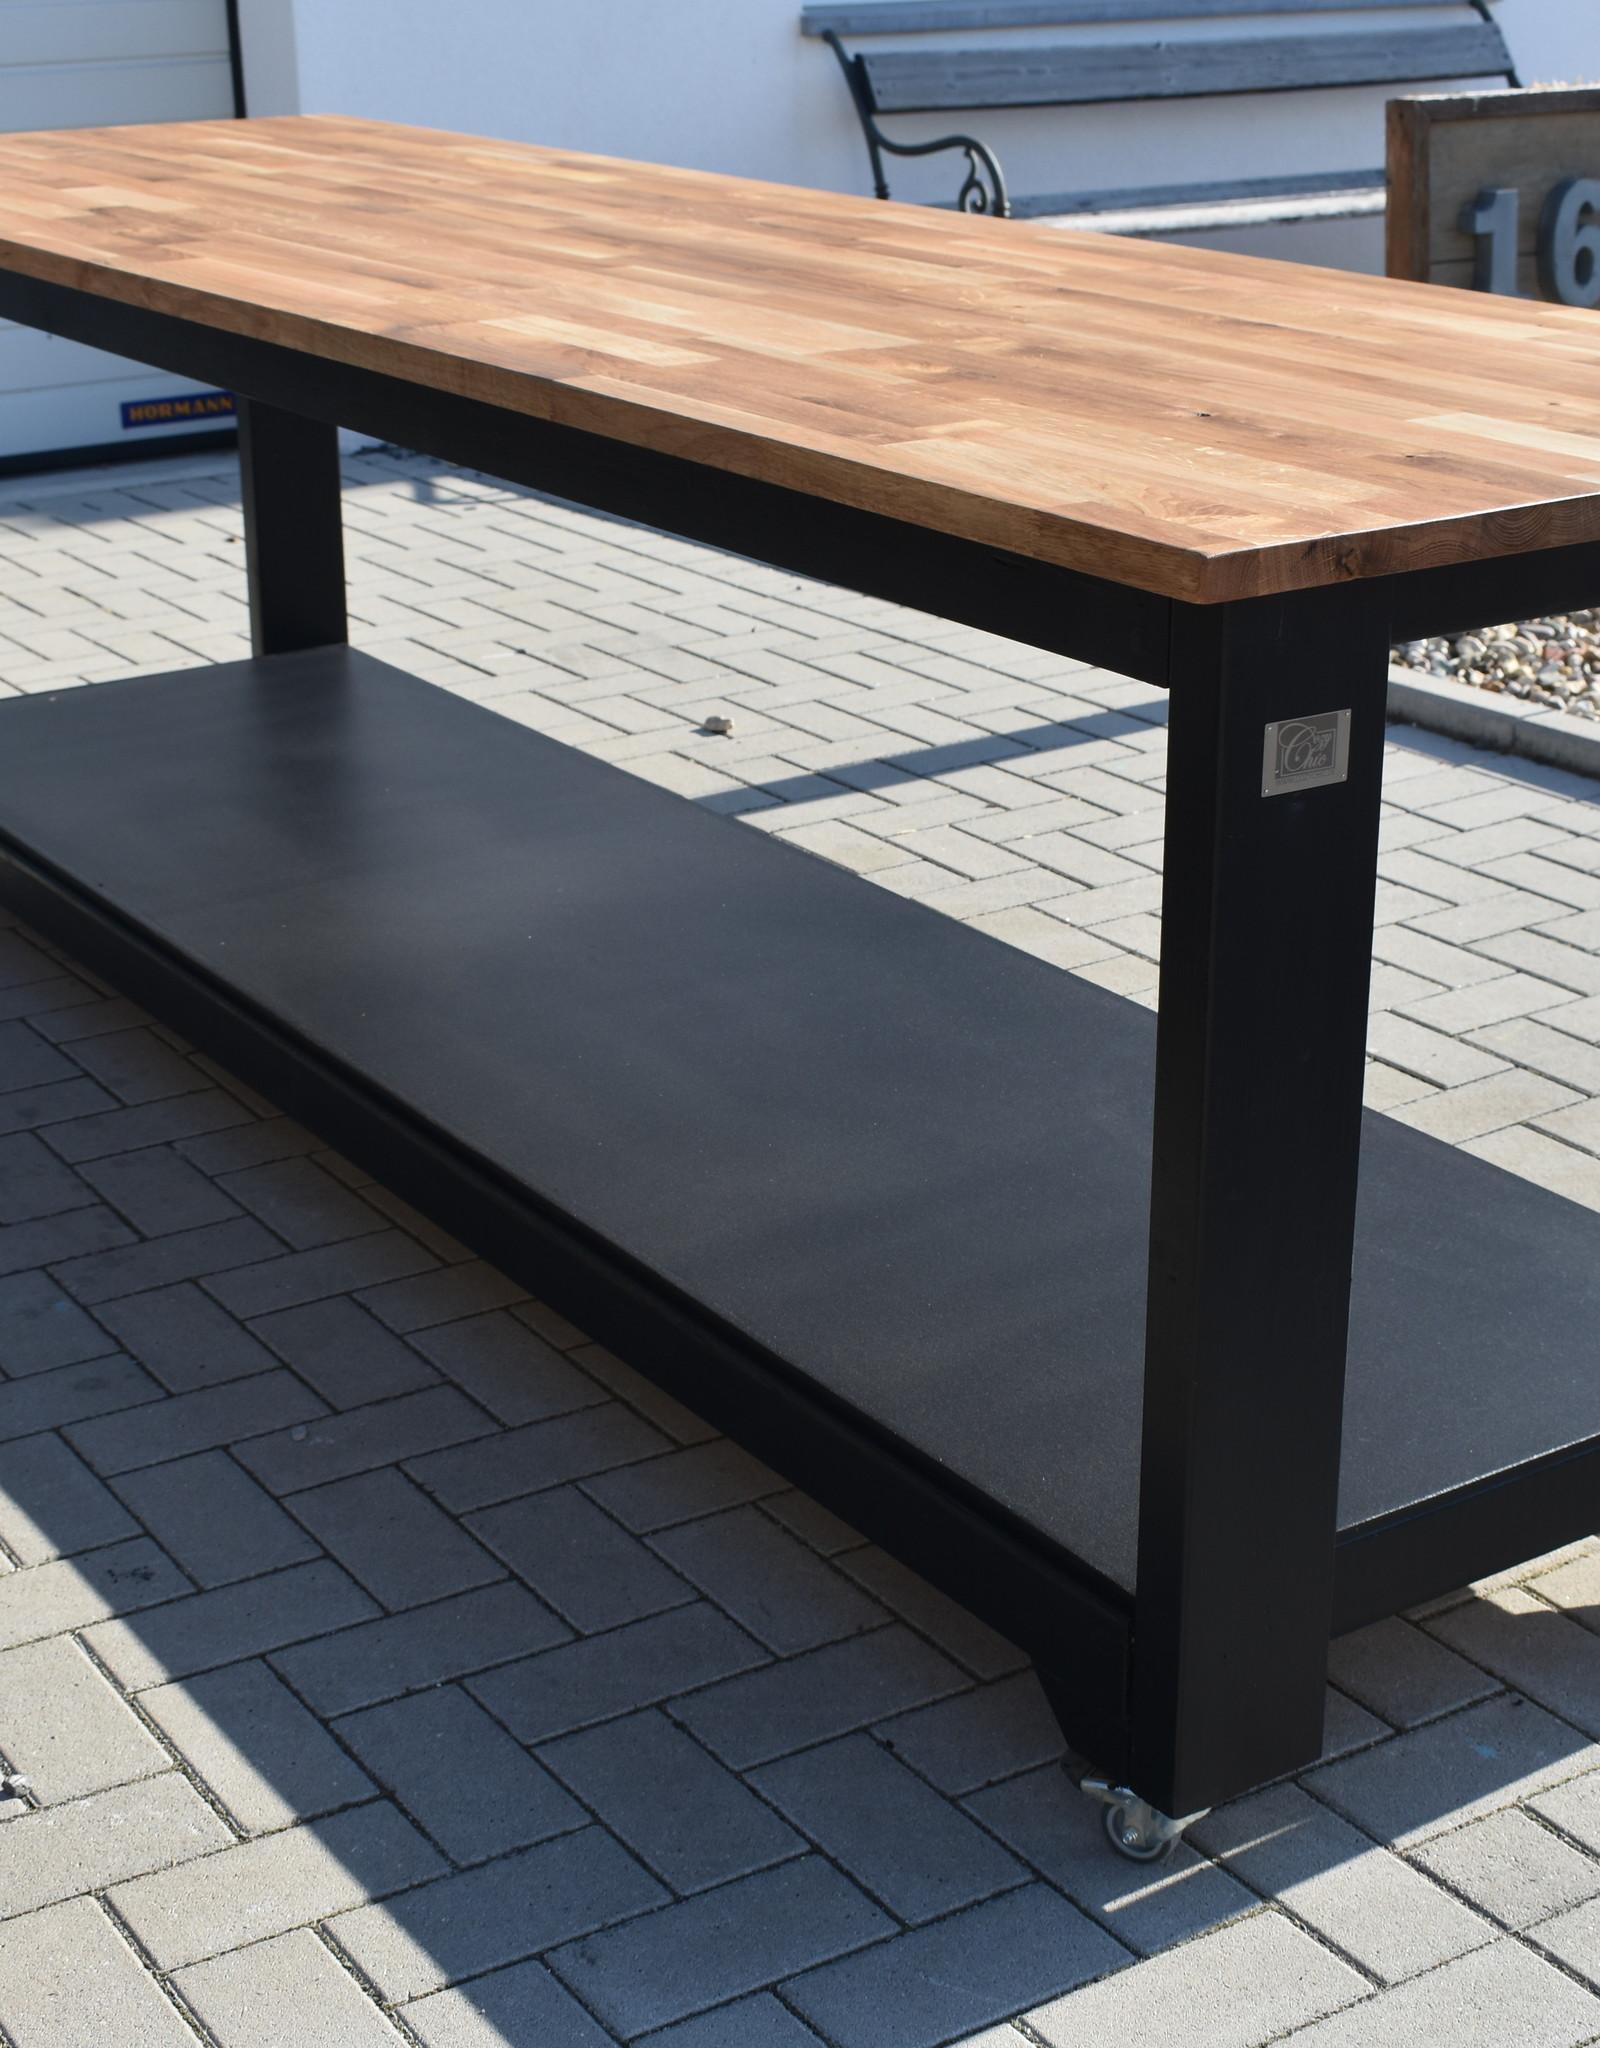 Winkeltafel / Presentatietafel